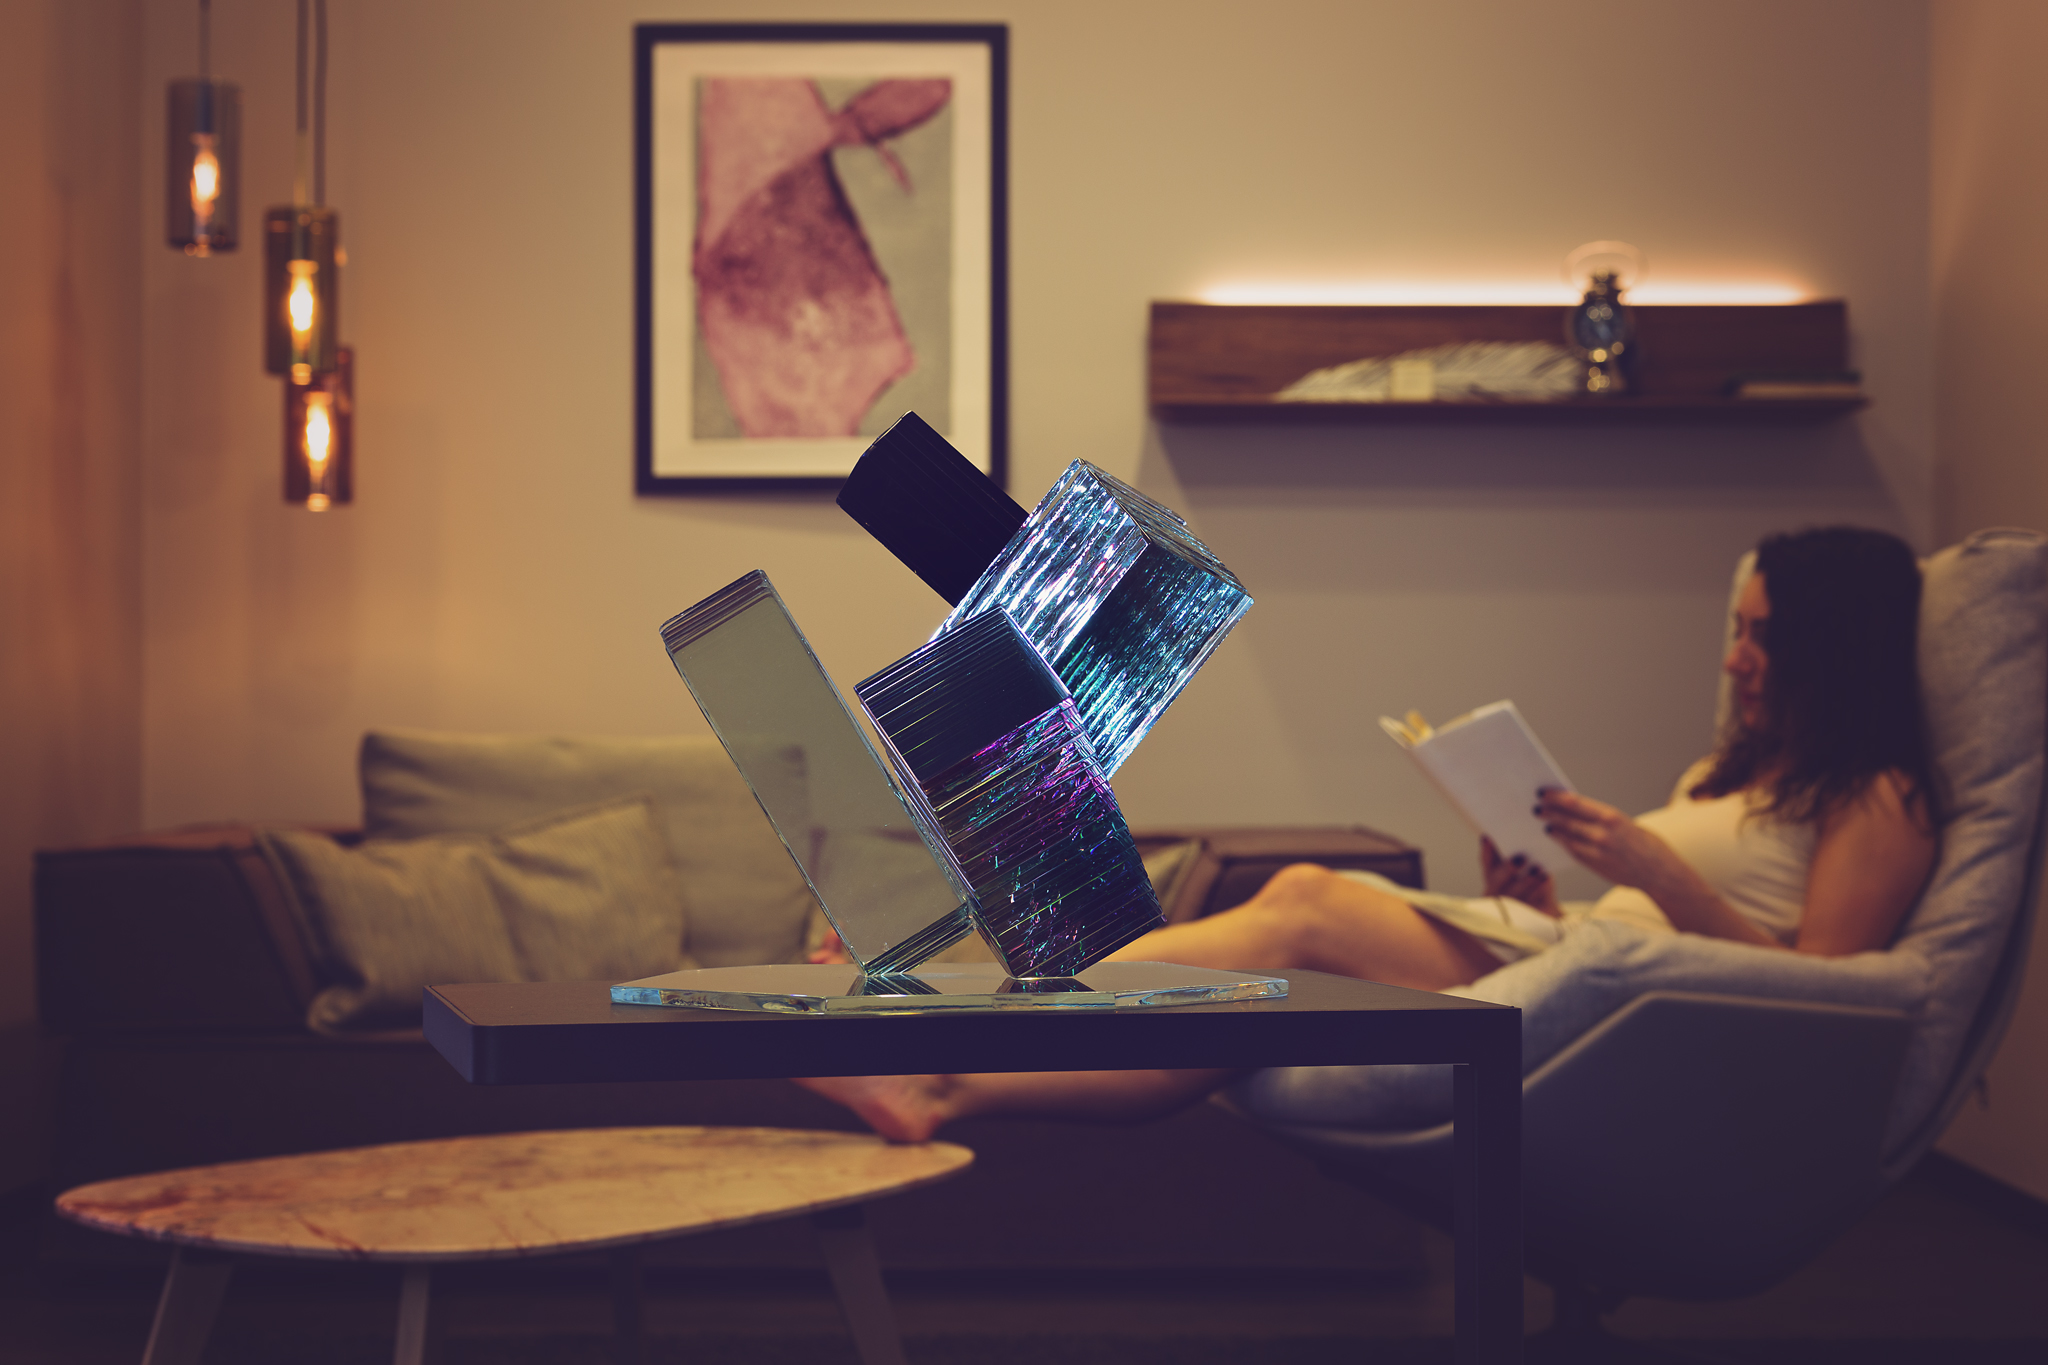 ekskluzīvas mēbeles, rolf benz_ dīvāni,